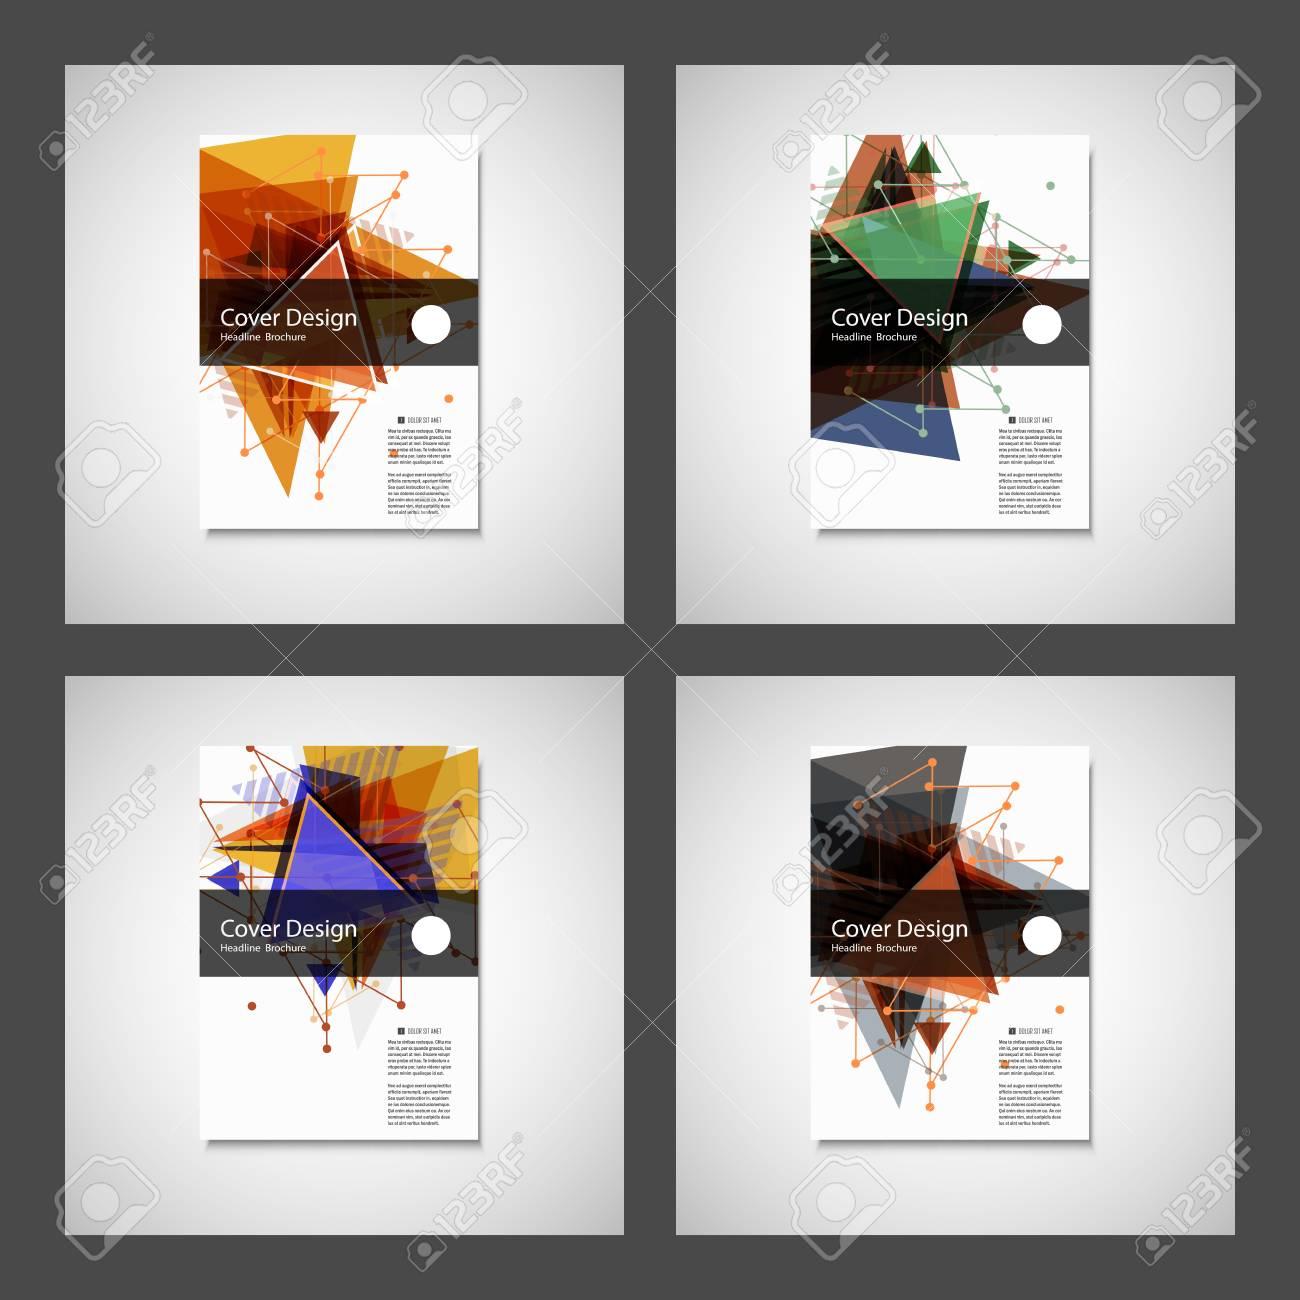 Abstract Triangle Brochure design. Modern vector illustration. - 63591485